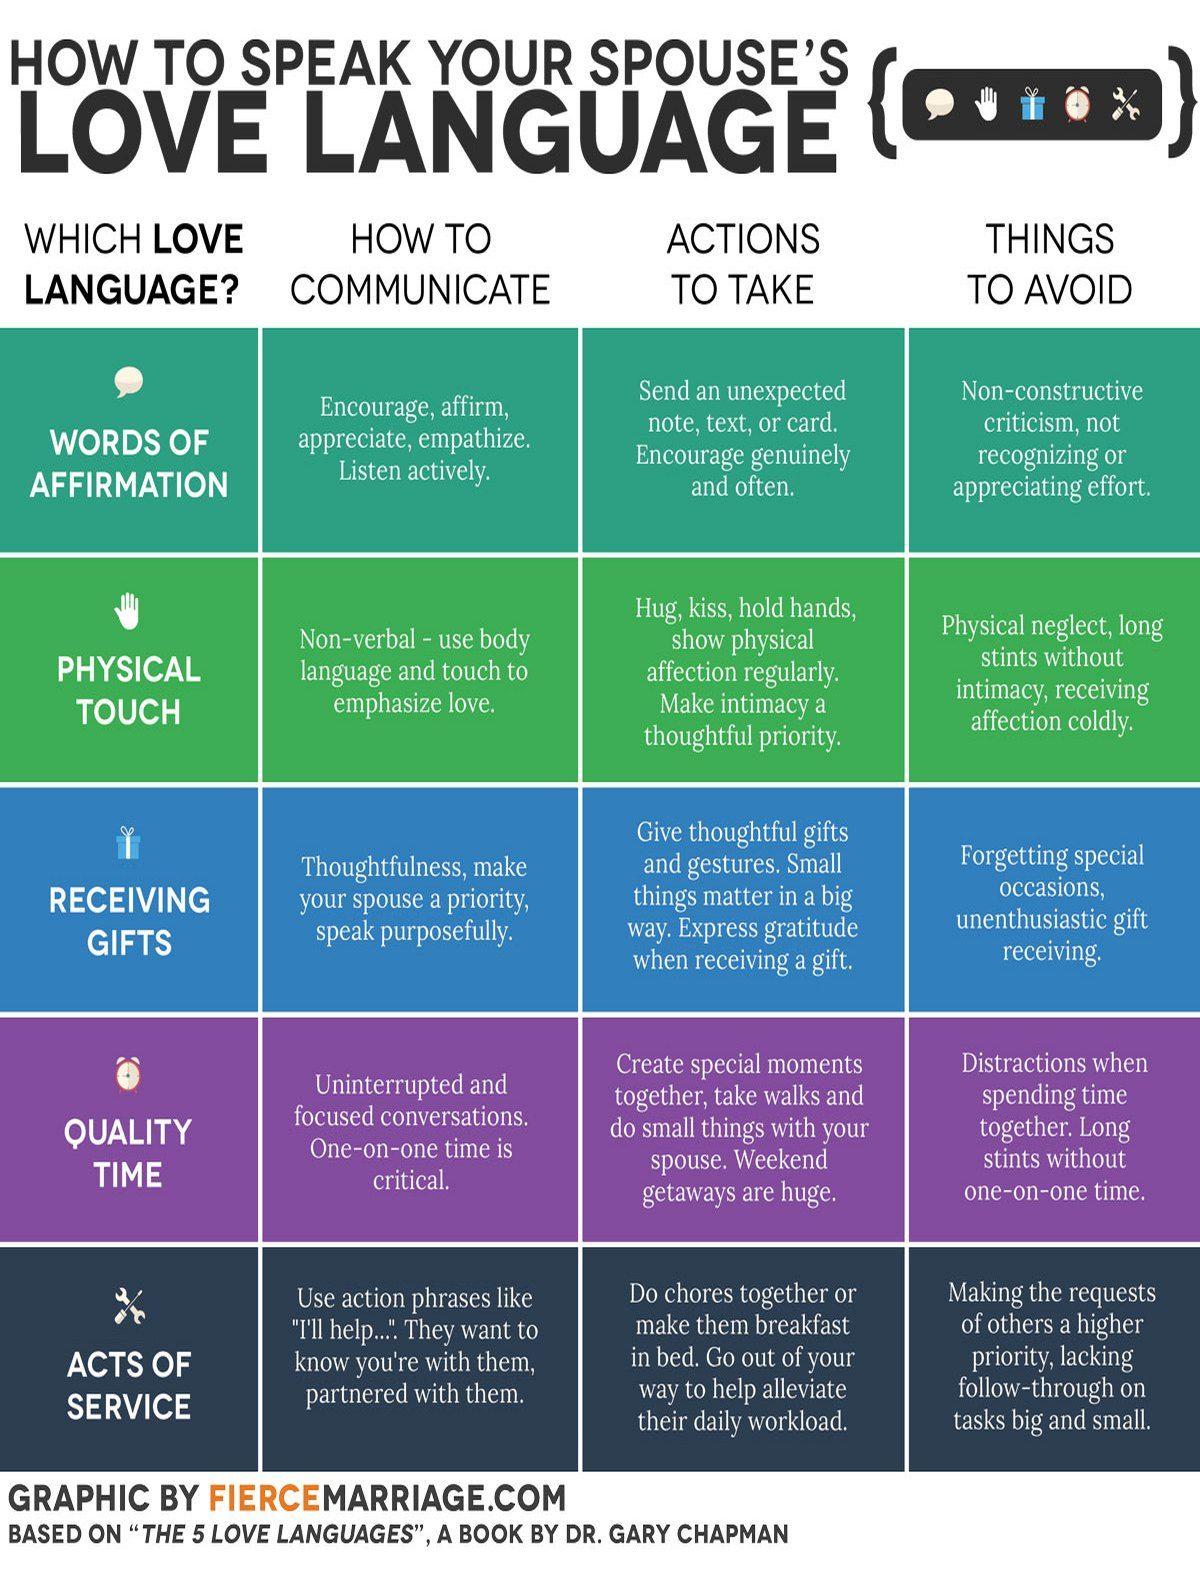 5 Love Languages for Kids Bundle: Digital and Printable Versions